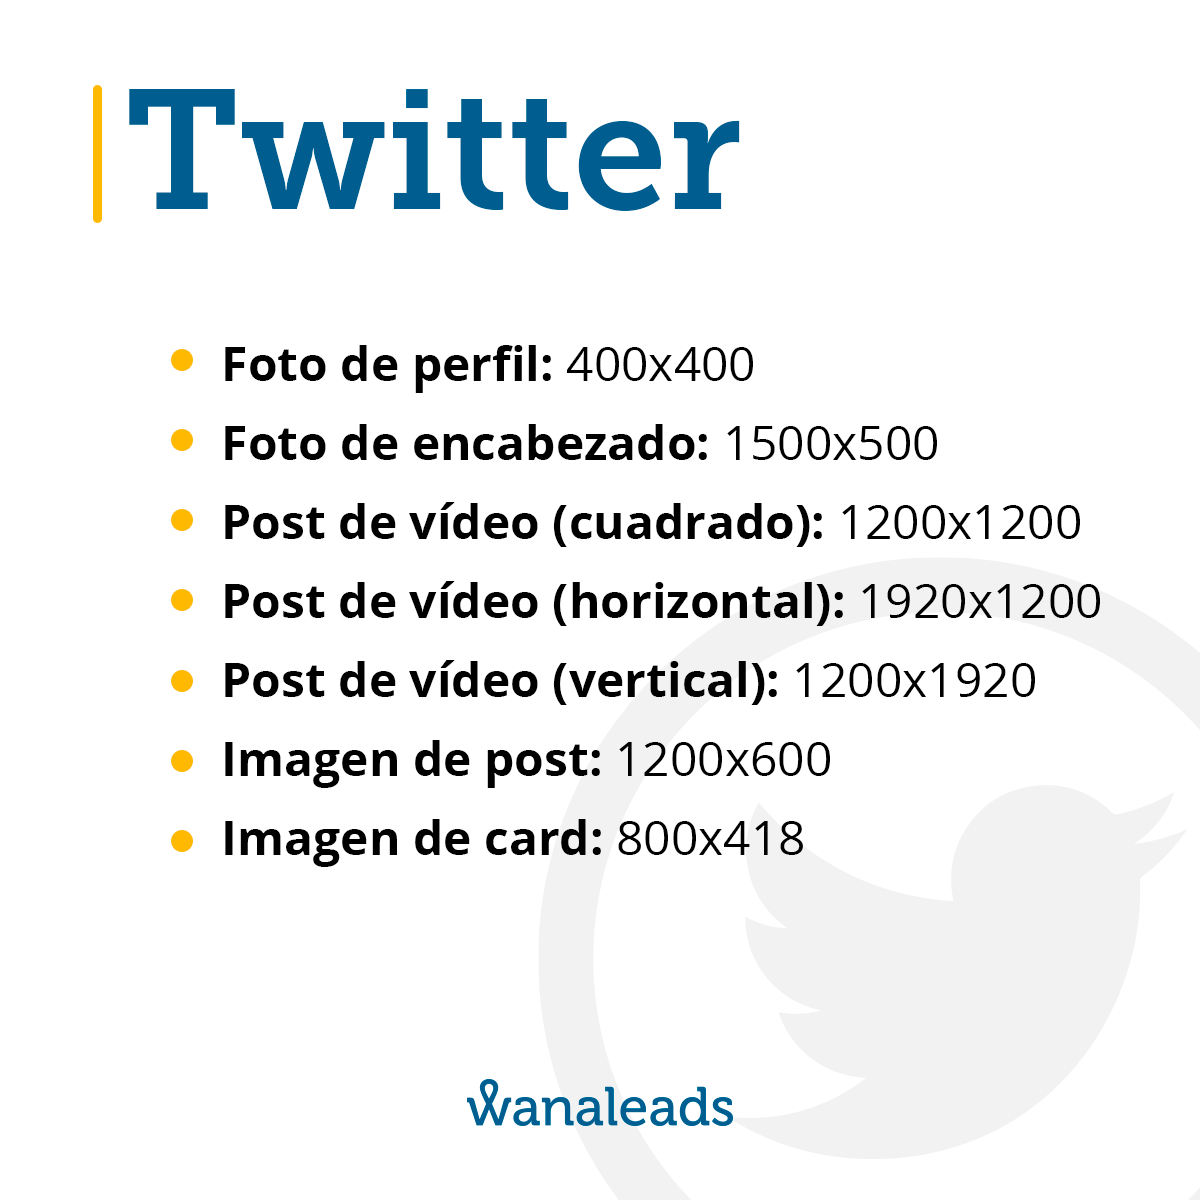 Tamaño de imágenes en redes sociales en 2021   Twitter